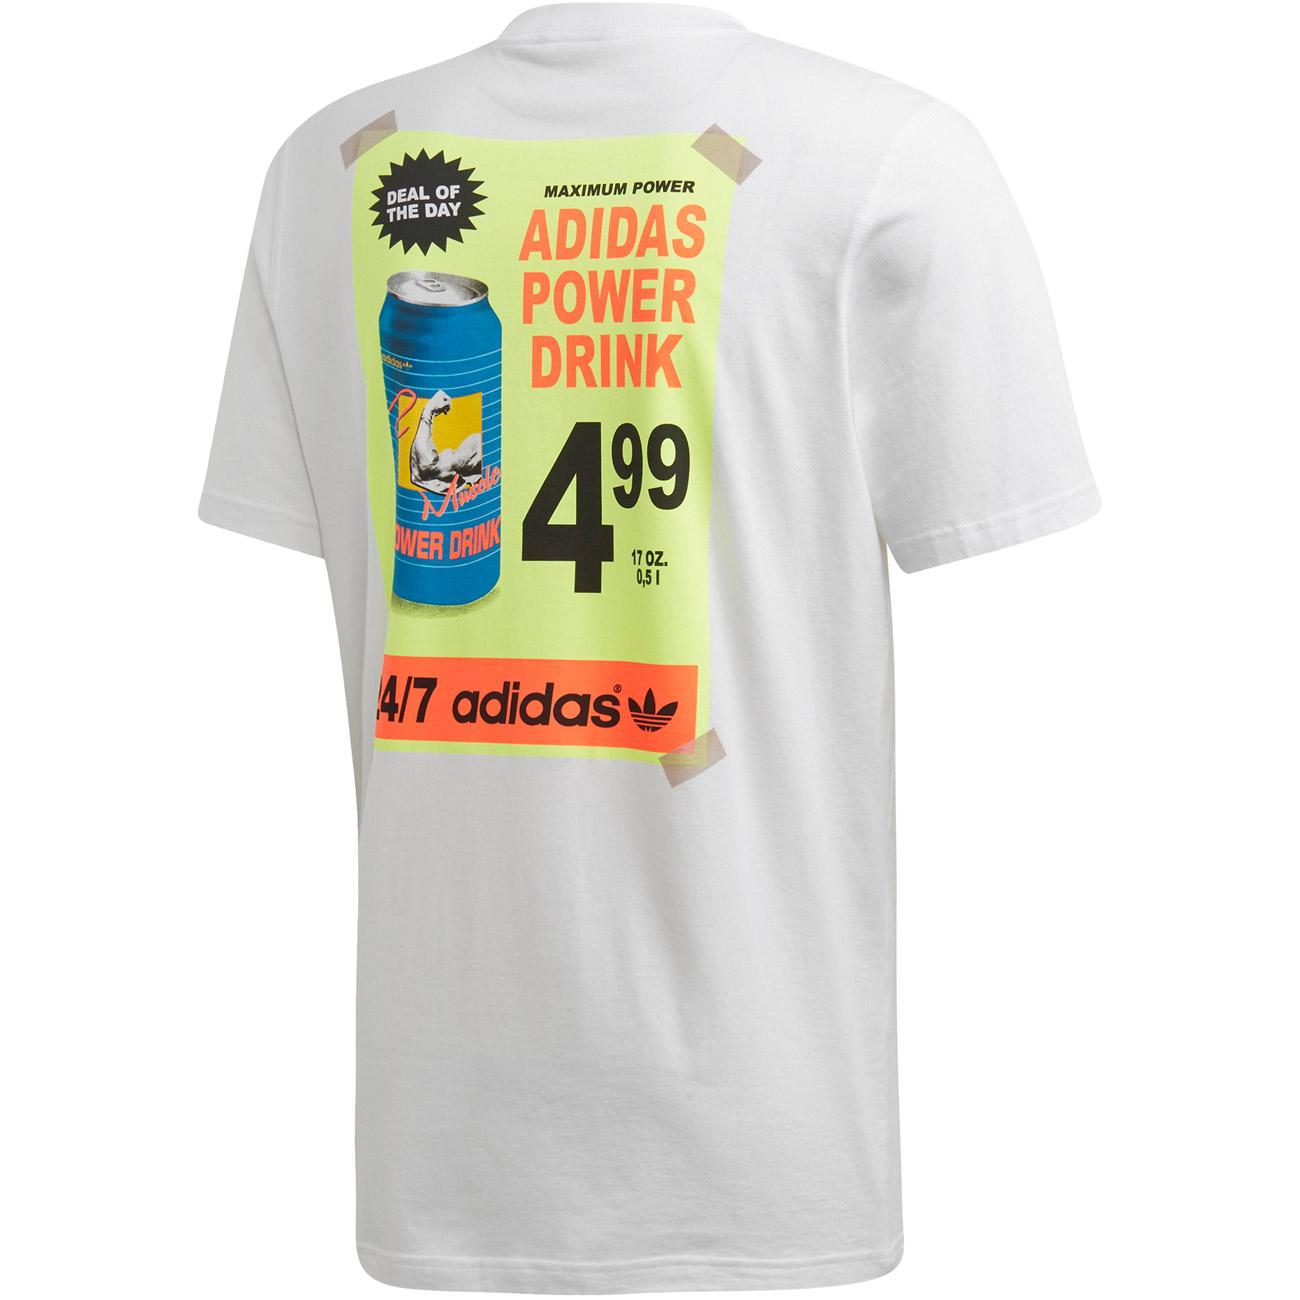 Adidas Originals Herren T Shirt BODEGA POSTER T